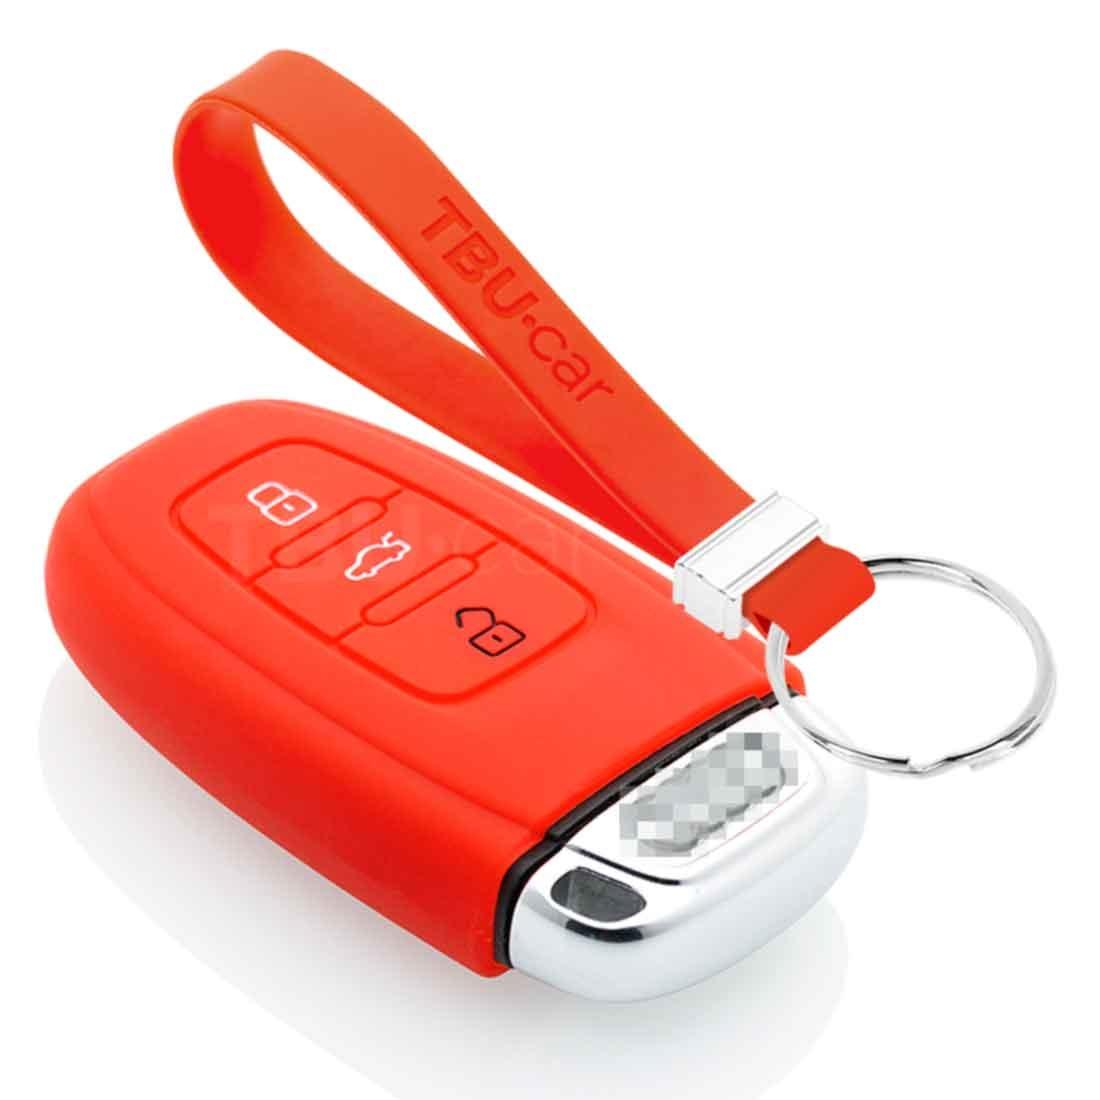 TBU car TBU car Autoschlüssel Hülle kompatibel mit Audi 3 Tasten (Keyless Entry) - Schutzhülle aus Silikon - Auto Schlüsselhülle Cover in Rot